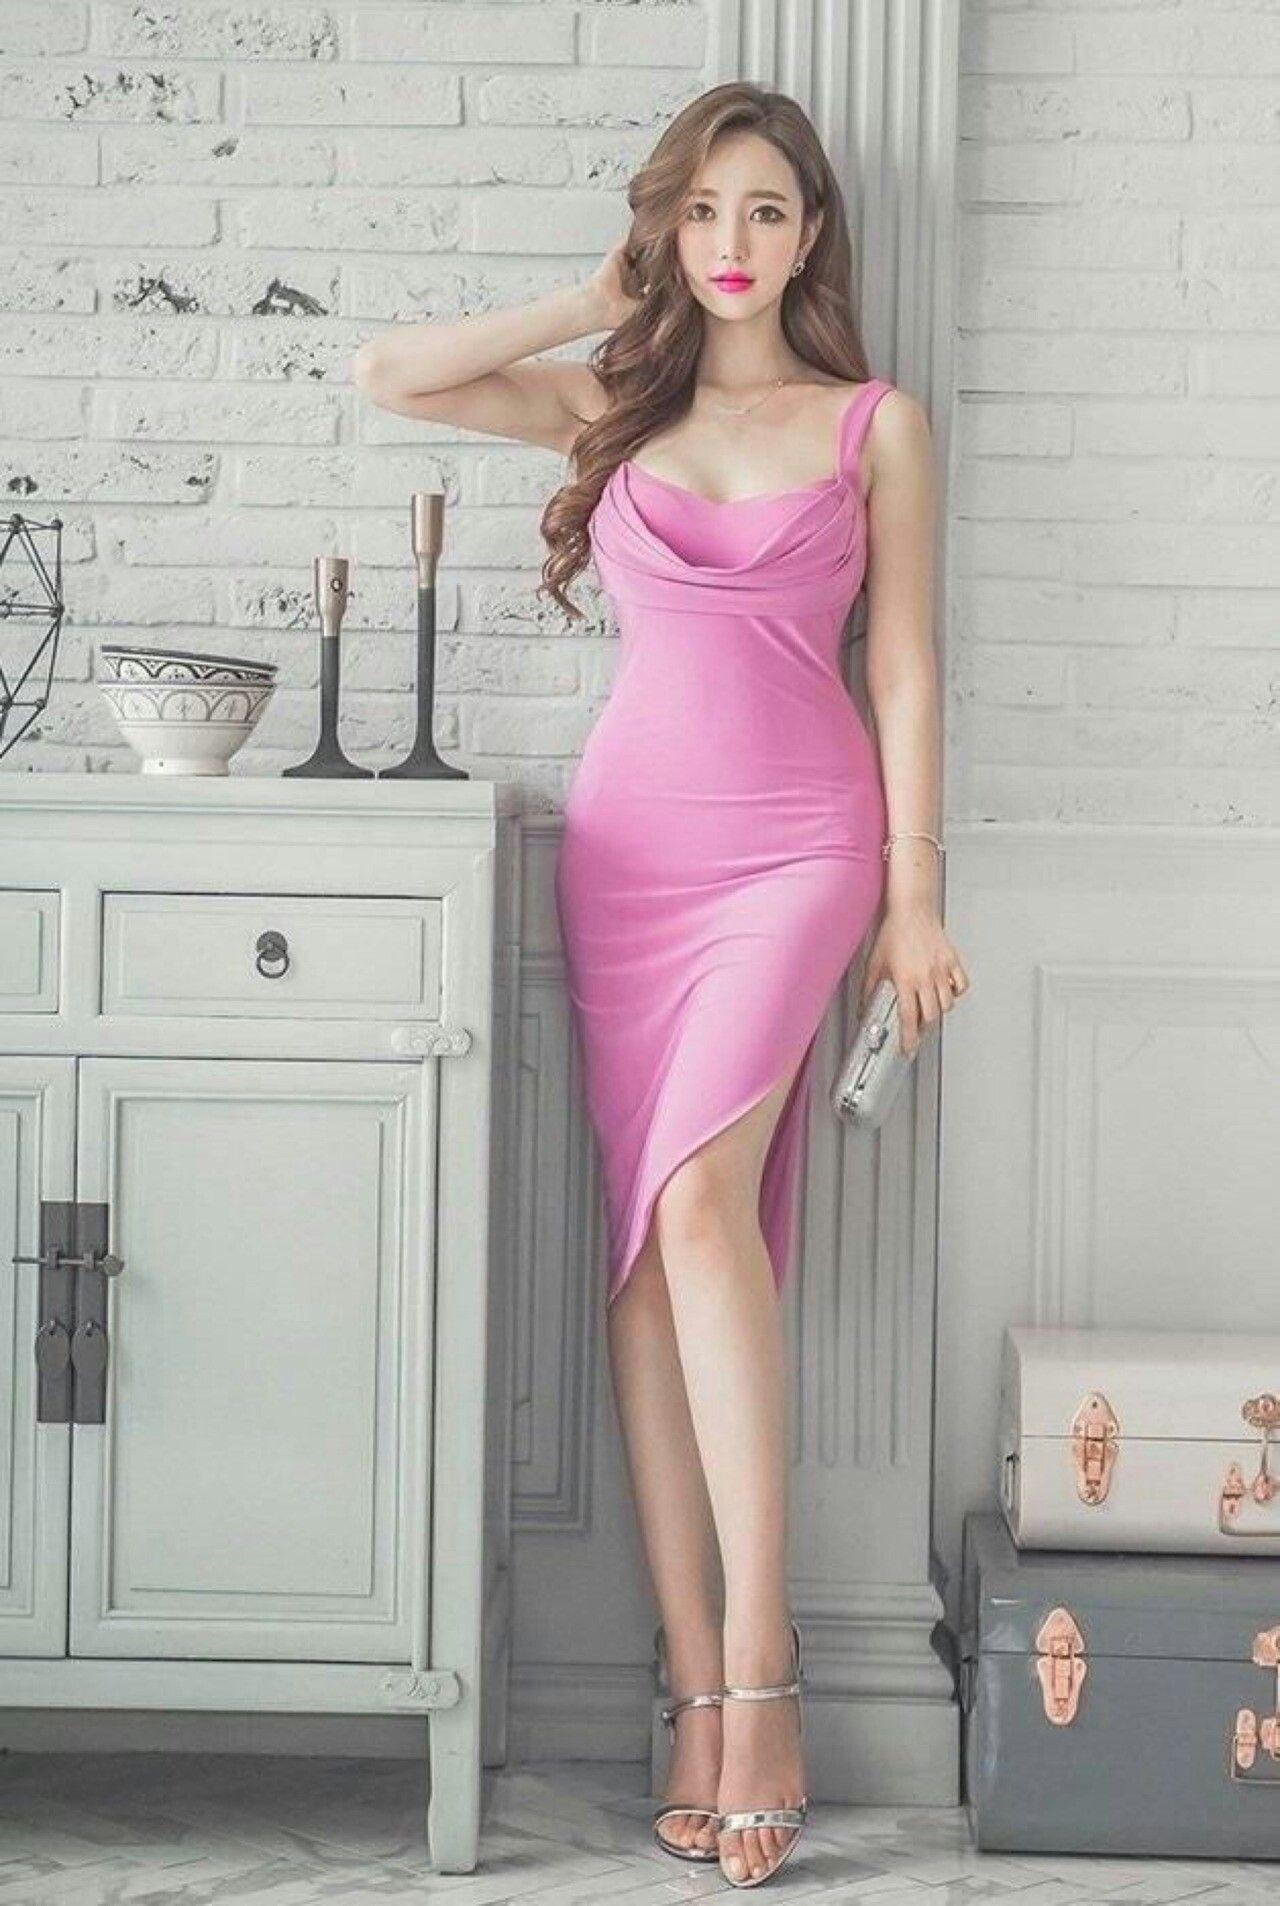 Pin de Rajawali Mma en My sexy girl   Pinterest   Vestido rosado ...